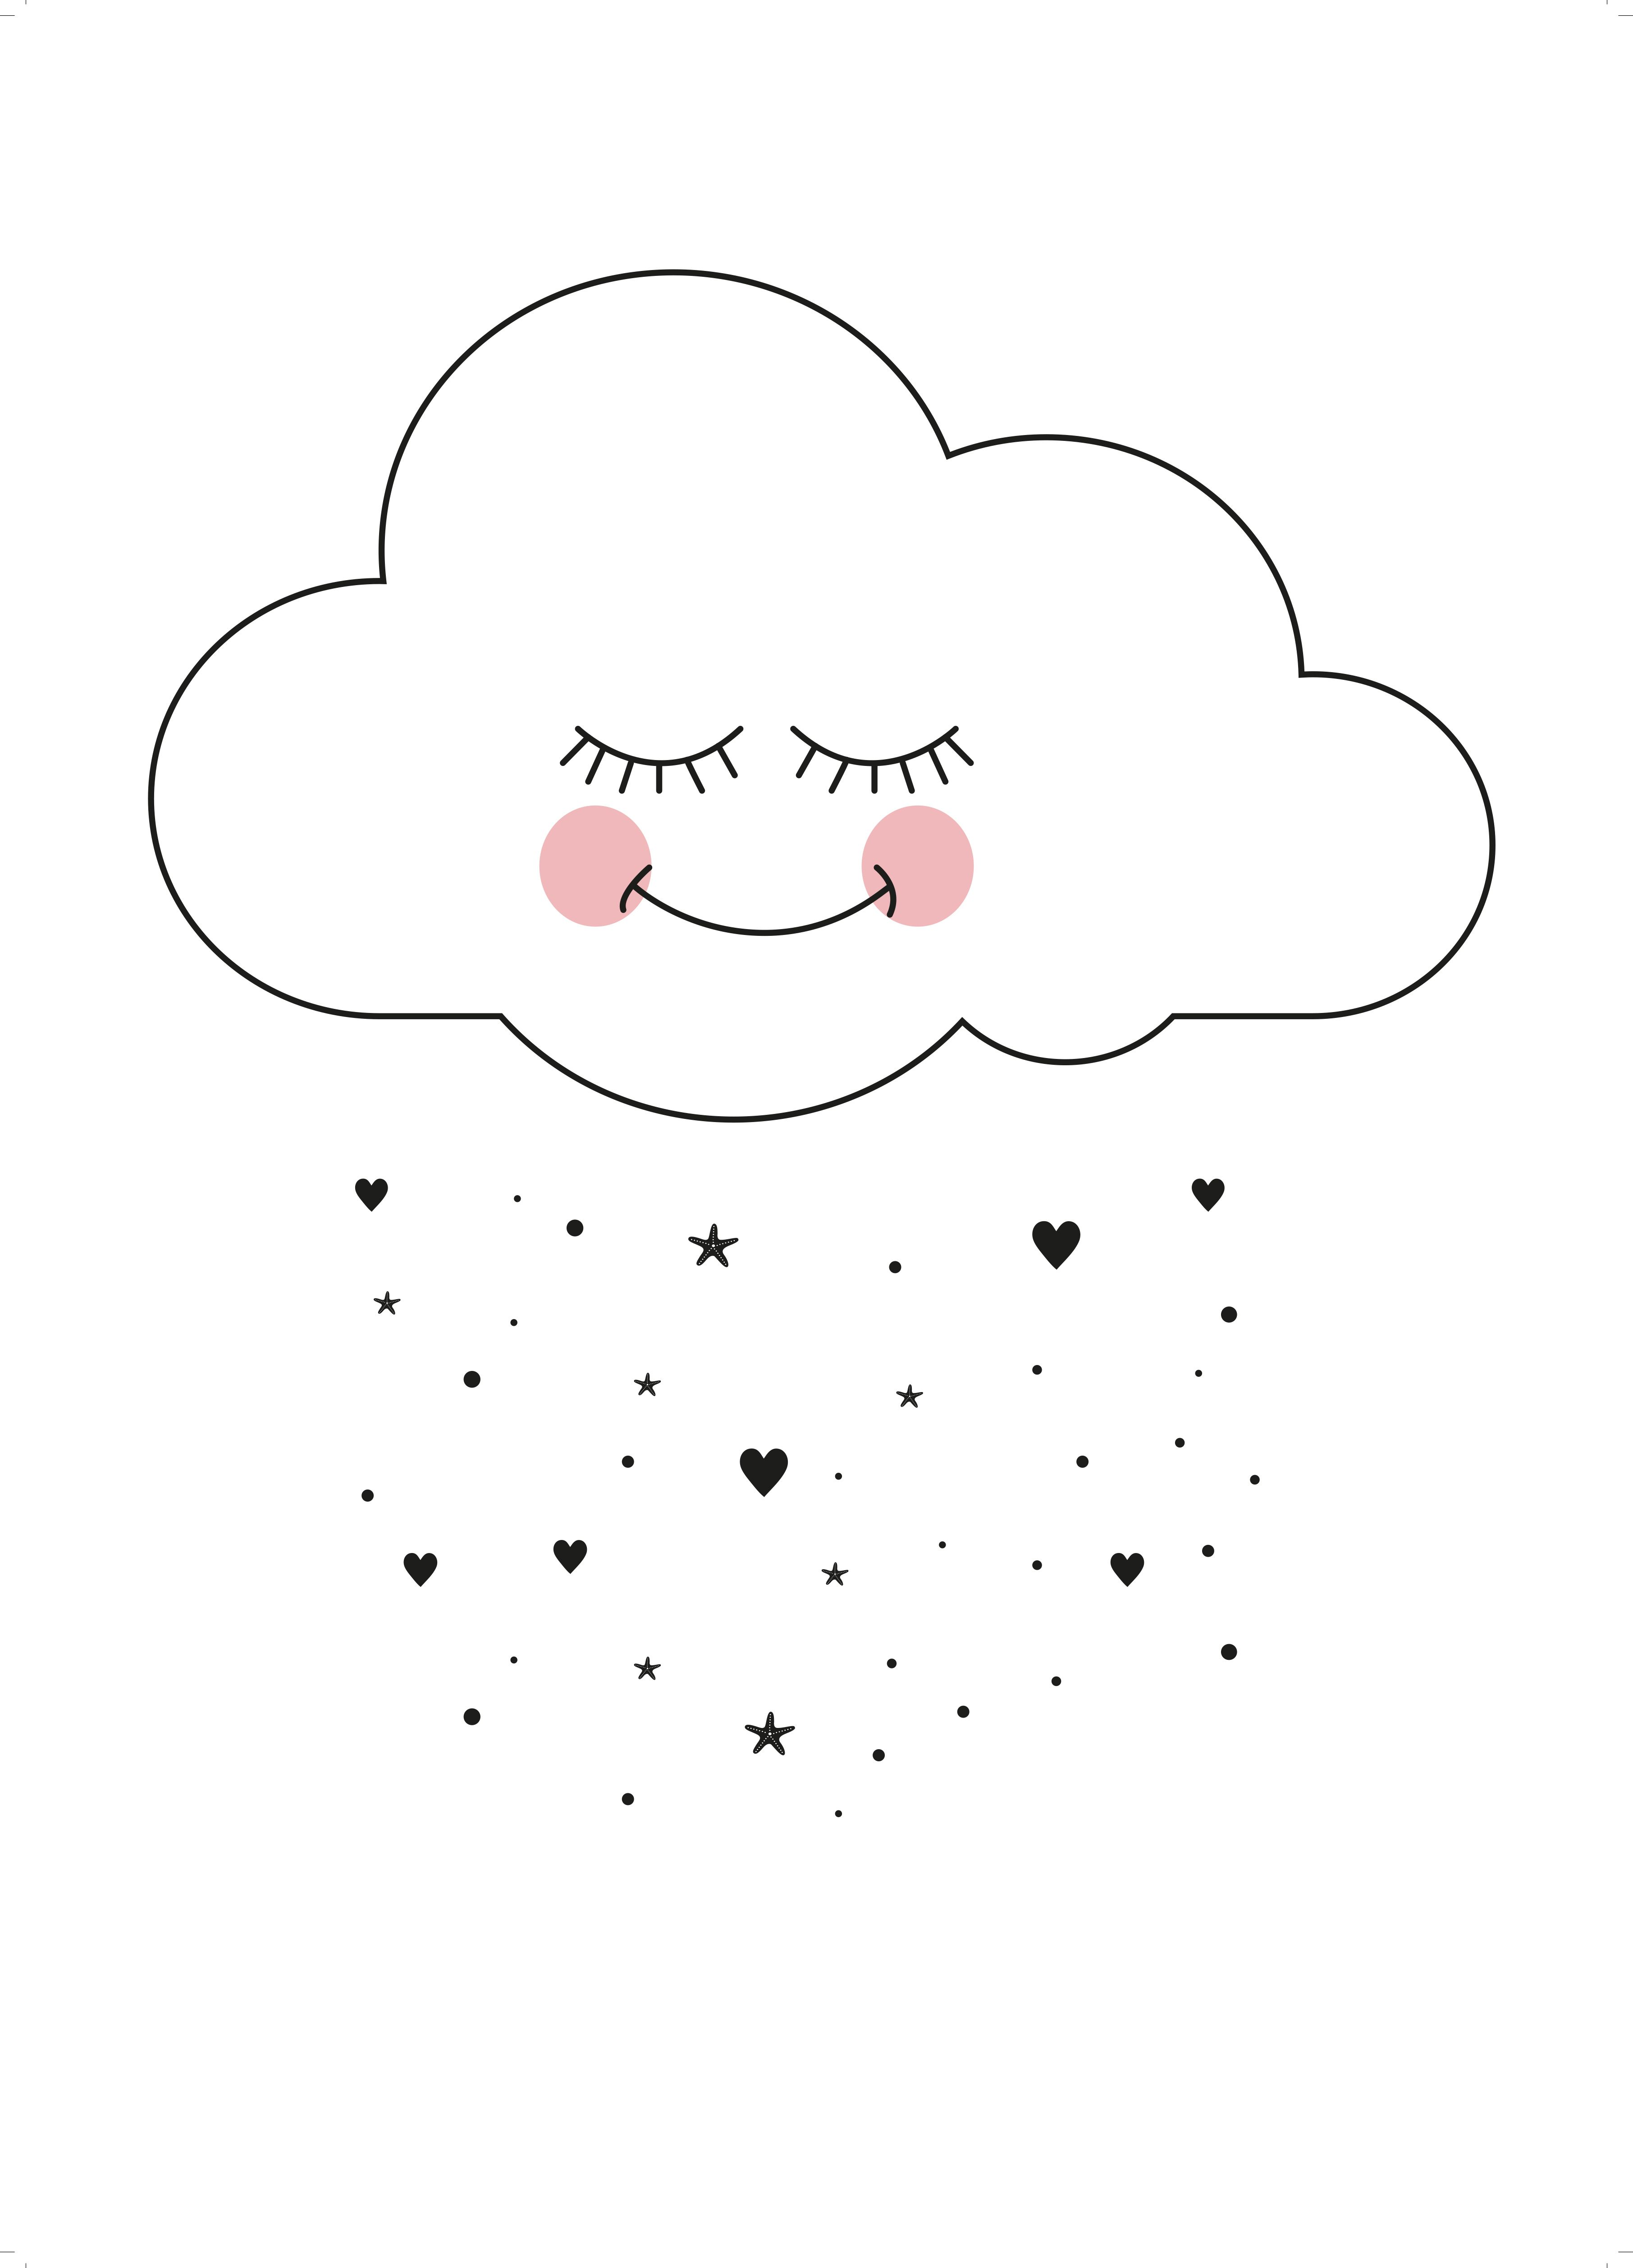 Lamina Nube Buscar Con Google Arte De Nube Produccion Artistica Cosas Lindas Para Dibujar